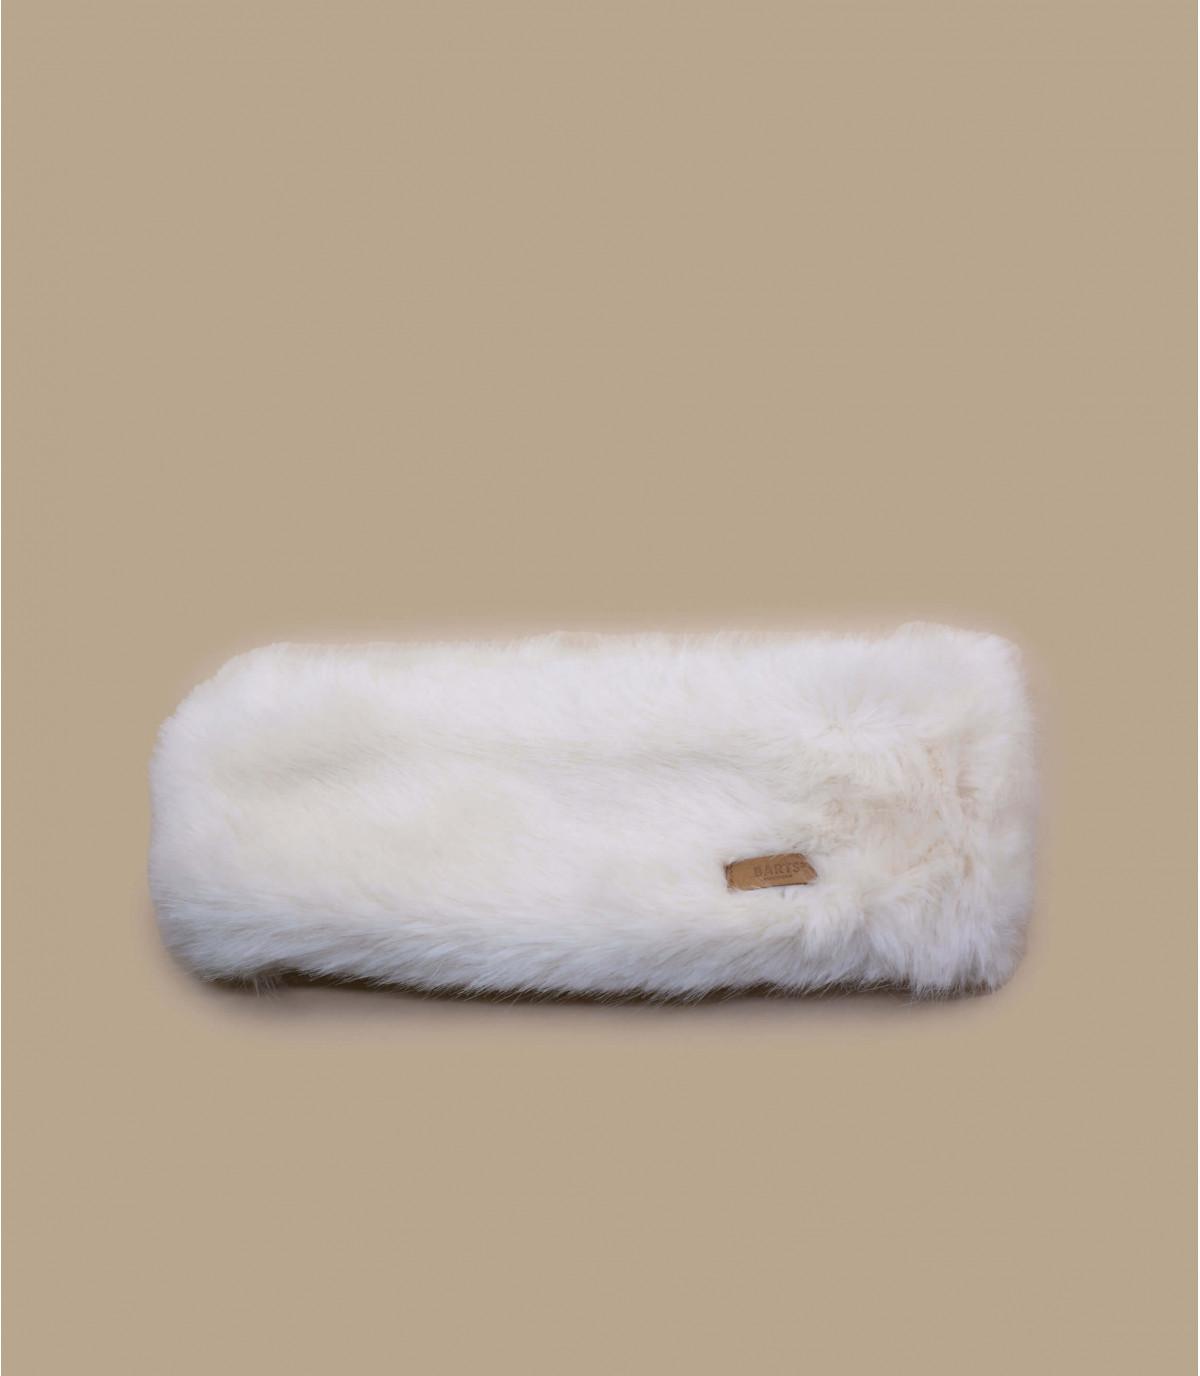 White fur headband - Fur Headband white by Mitchell and Ness. 794ebcca6e9